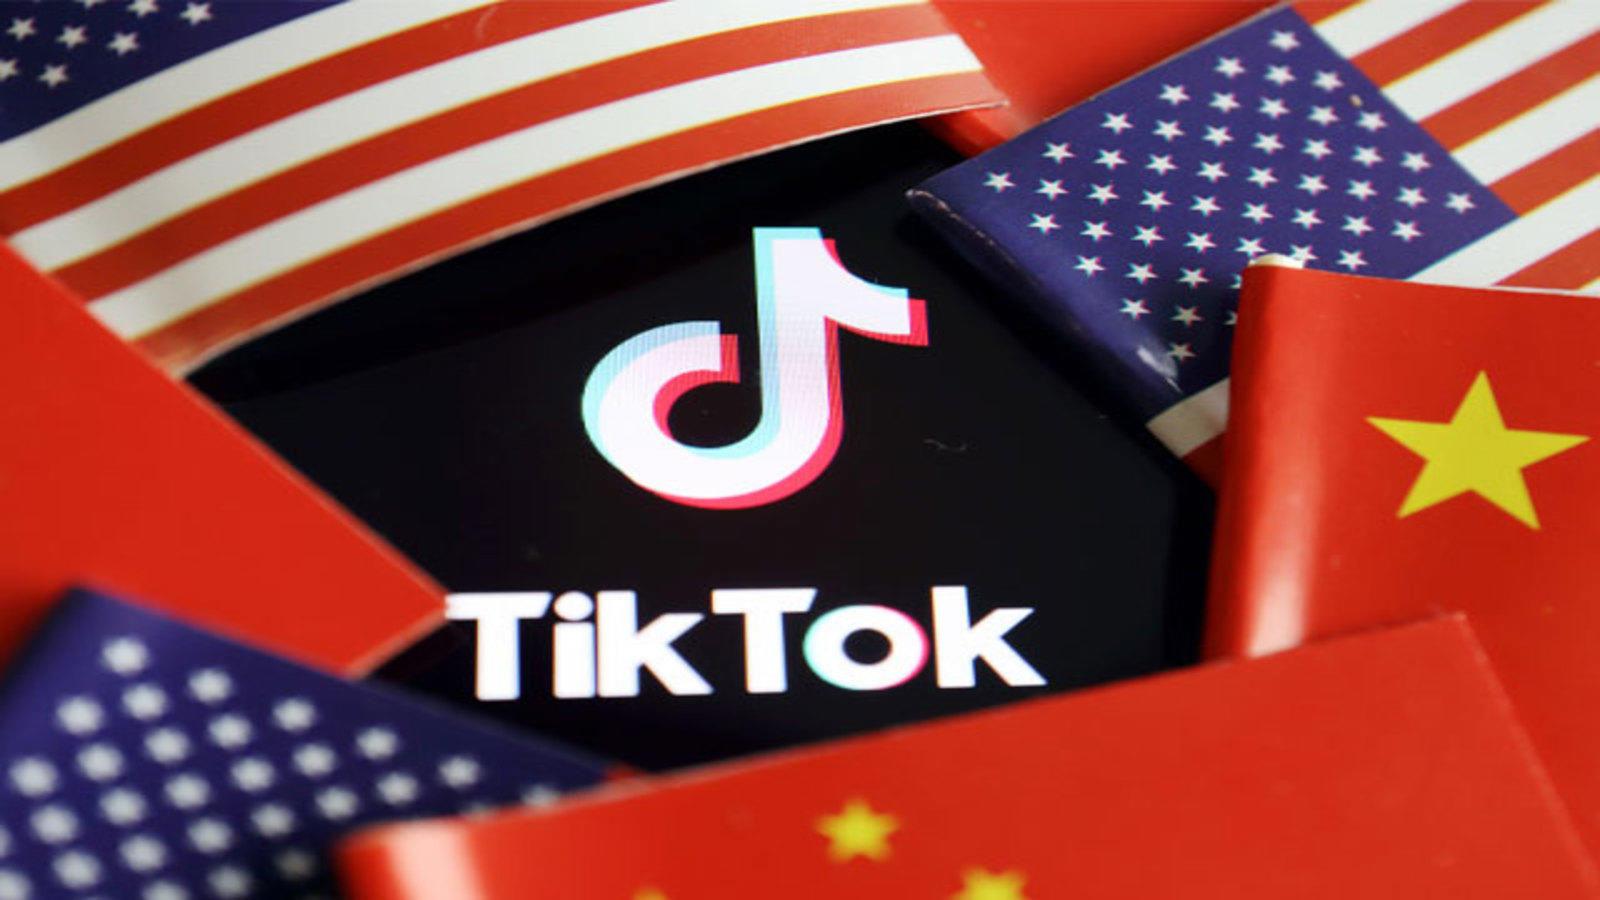 tiktok-global-to-launch-public-offering-says-bytedance